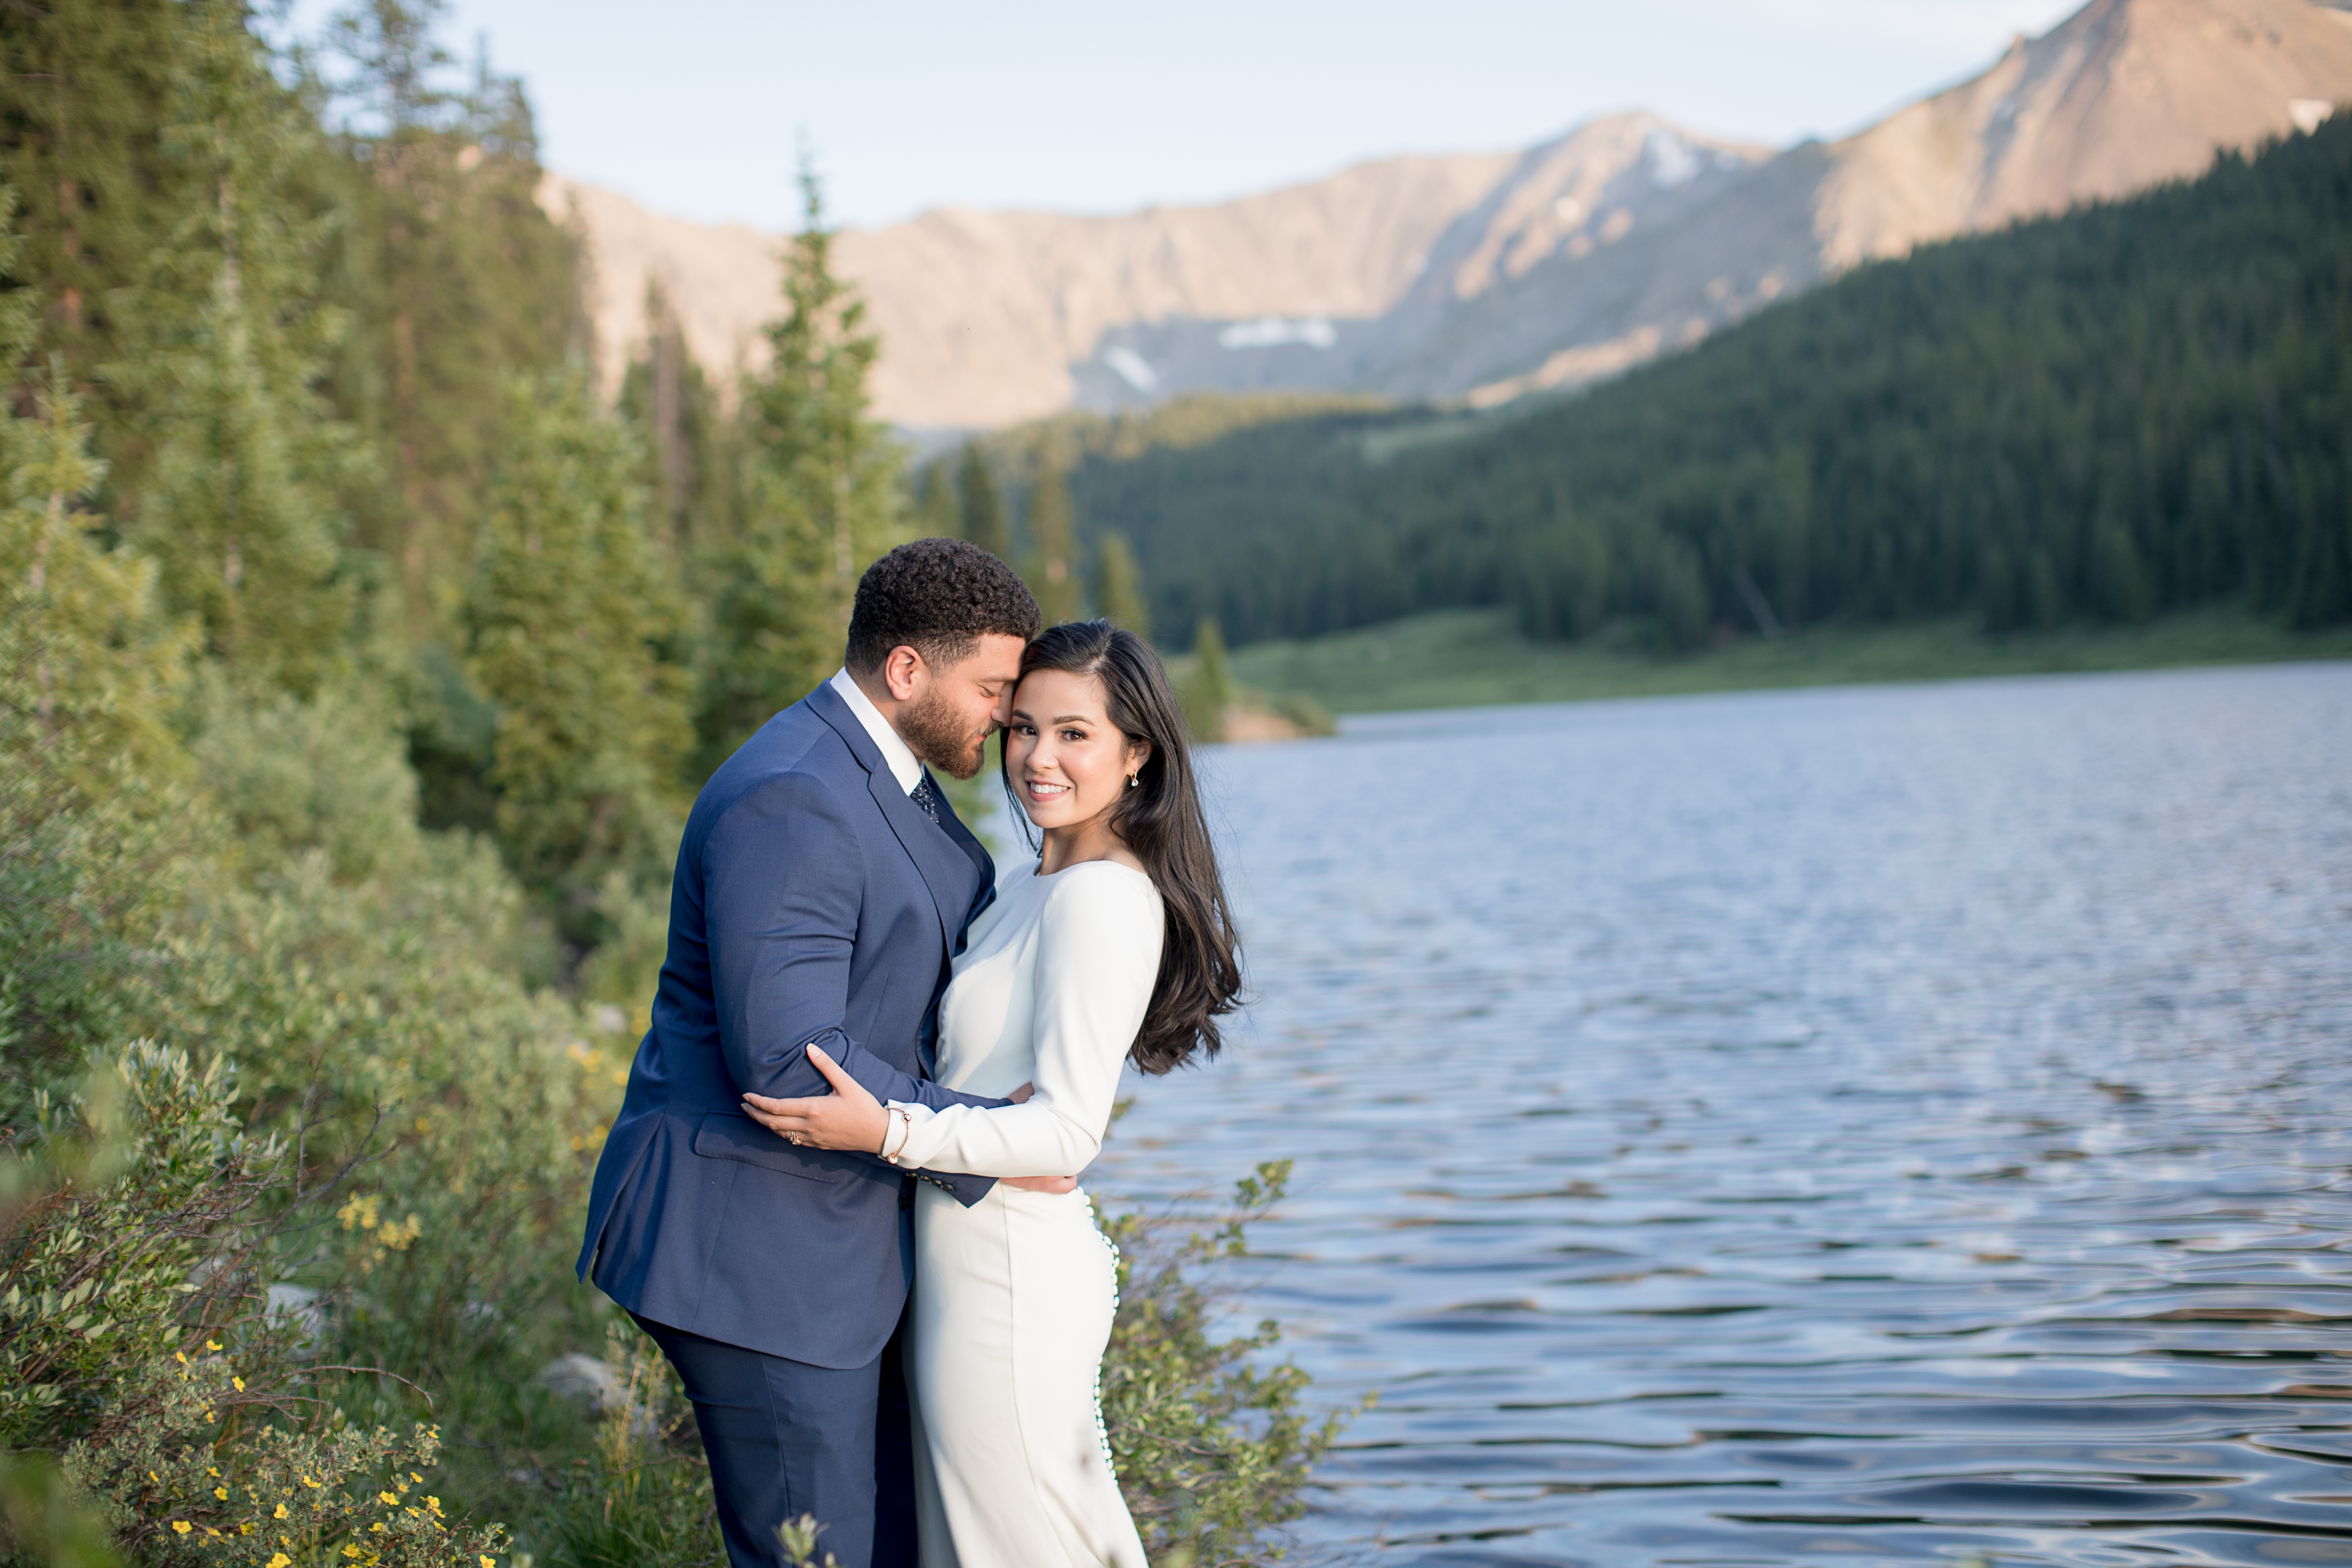 Clinton-Gulch-Reservoir-Breckenridge-Colorado-Elopement-Bride-and-Groom-Mountain-and-Lake